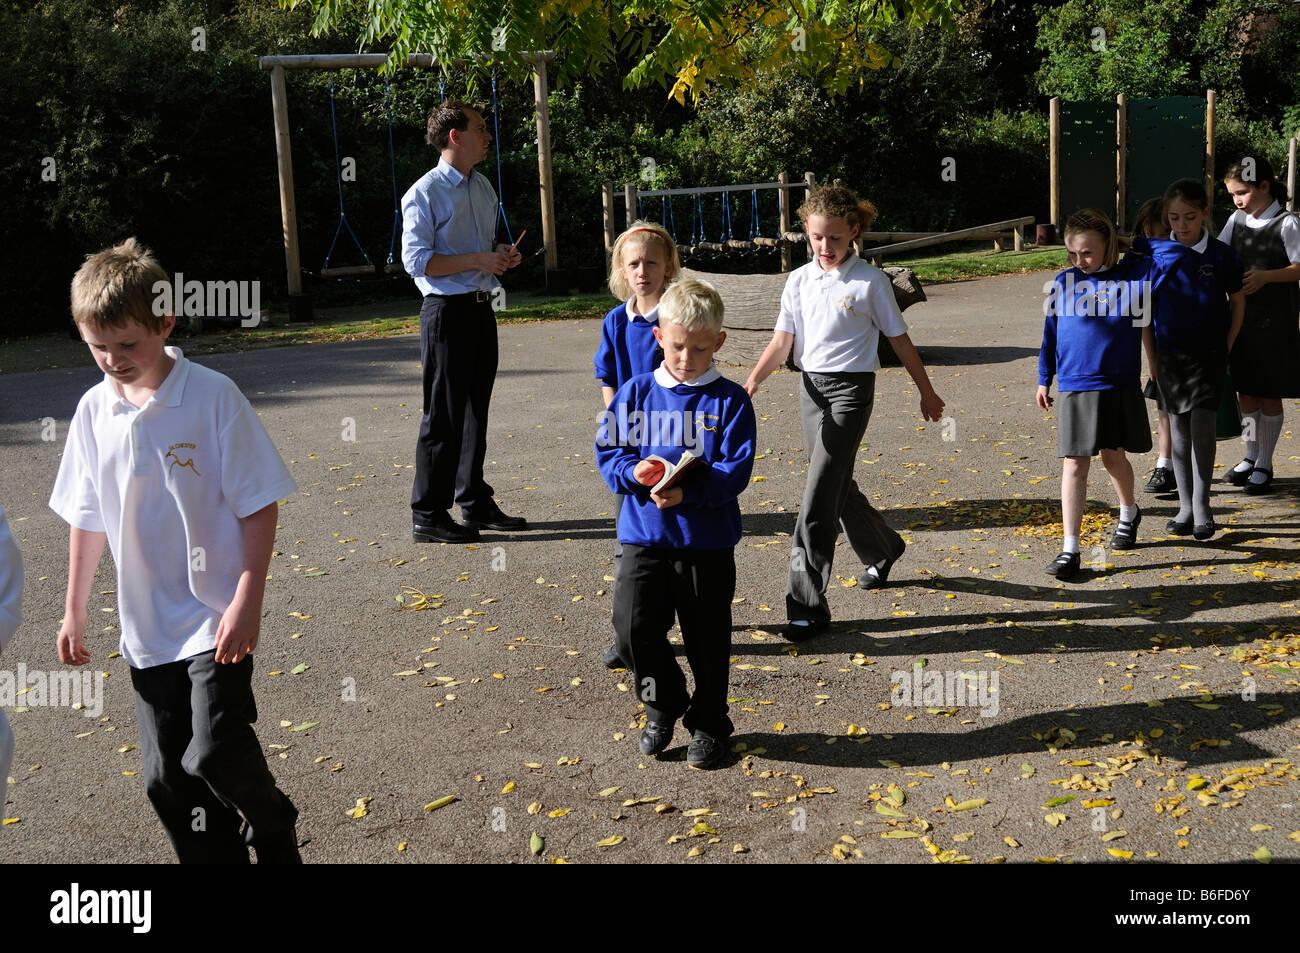 Schoolchildren walking in line in a school playground - Stock Image